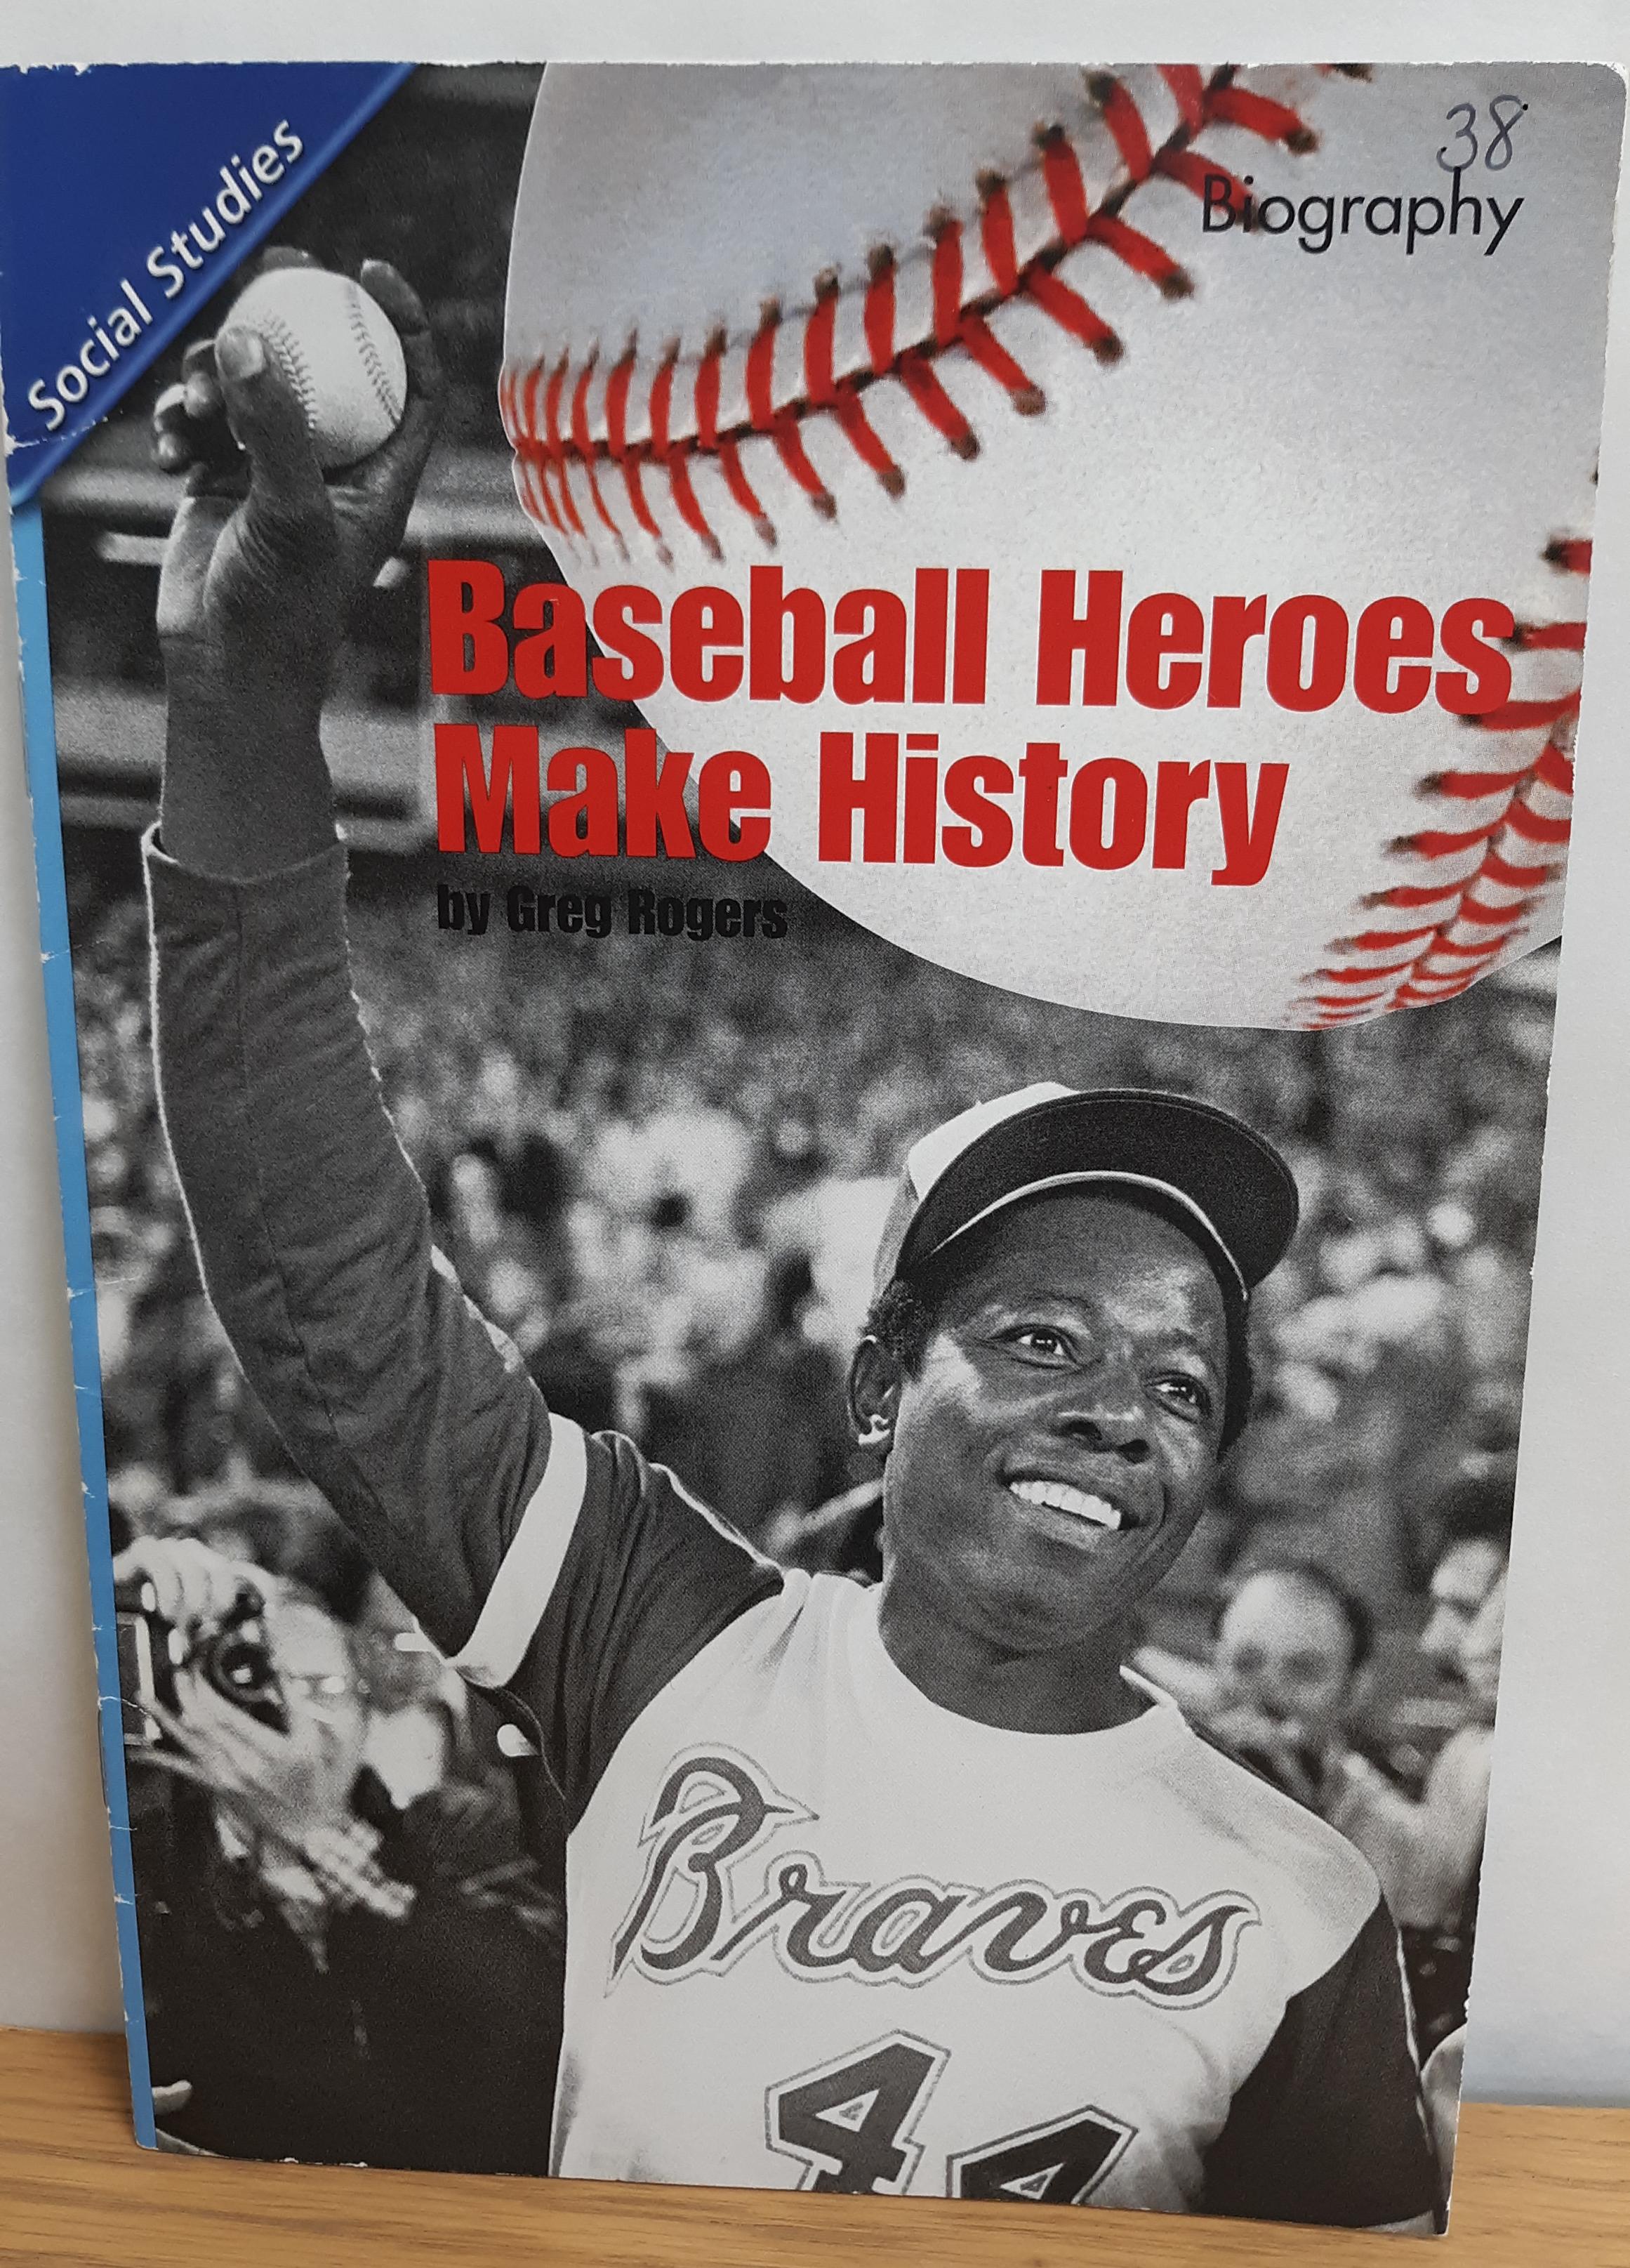 https://0201.nccdn.net/4_2/000/000/01e/20c/baseball-heroes-make-history.png